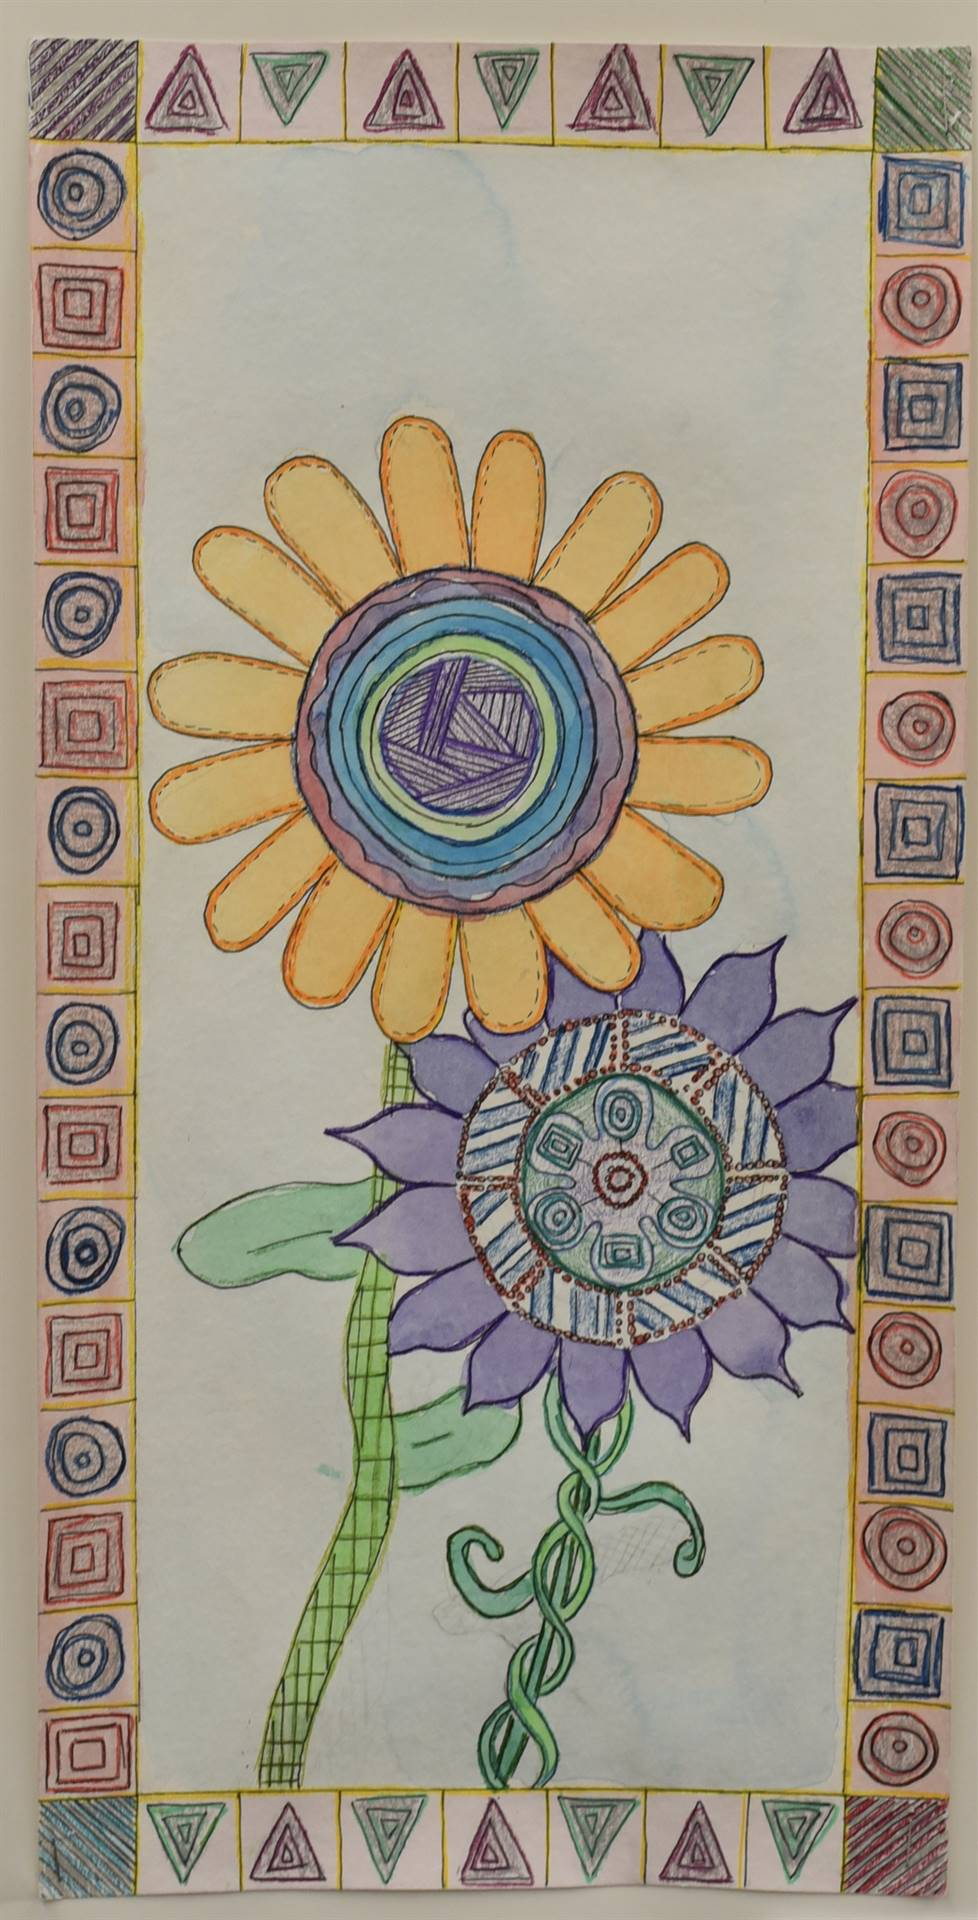 Brecksville-Broadview Hts. Middle School Art Projects 168